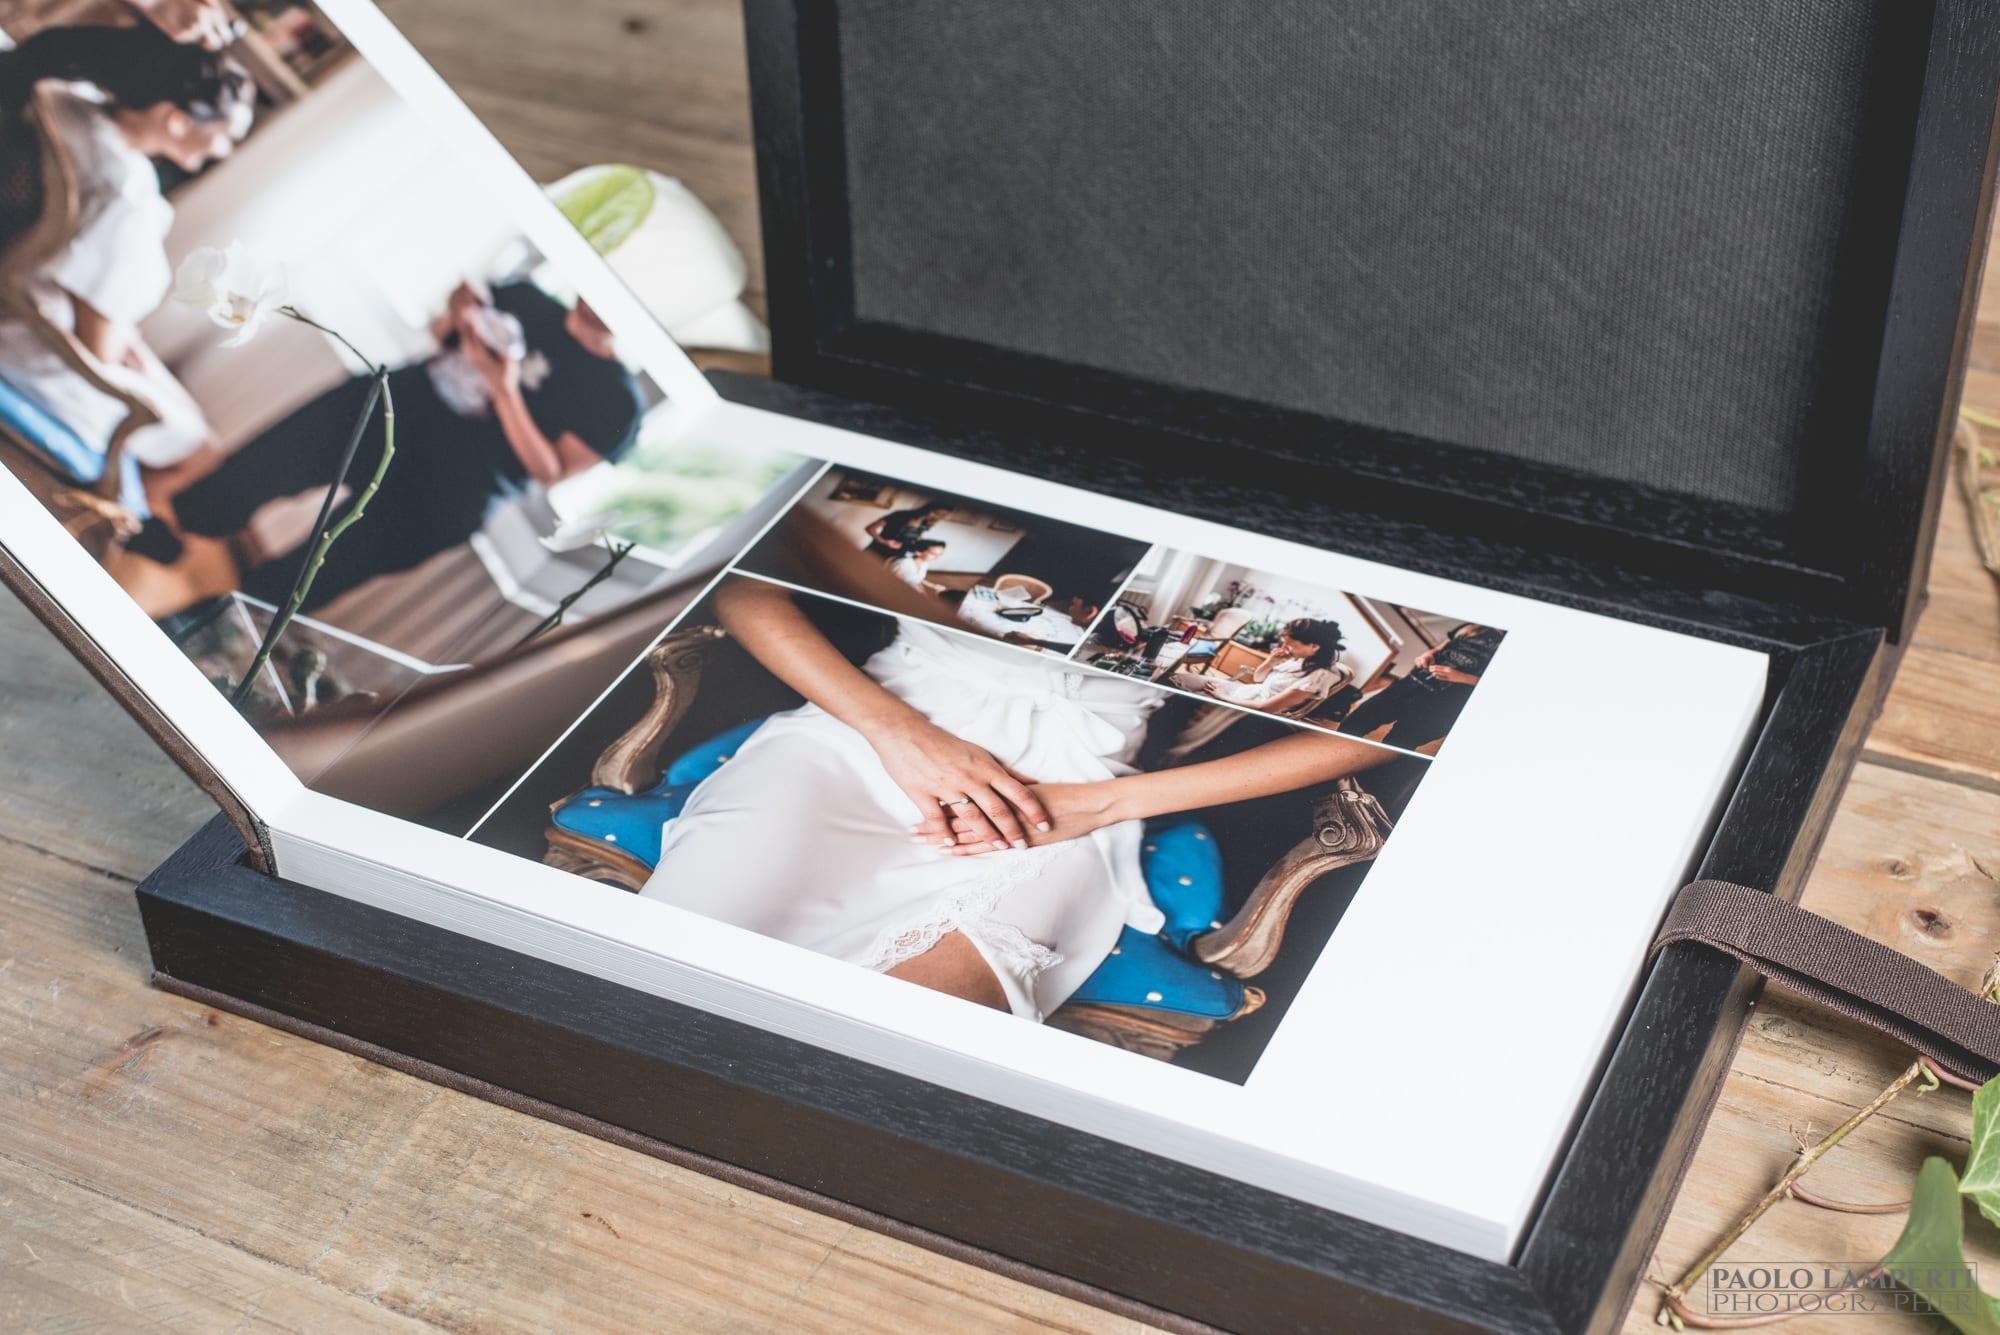 photo-book-or-wedding-album-photobook-ready-to-print.jpg (2000Ã?1335)